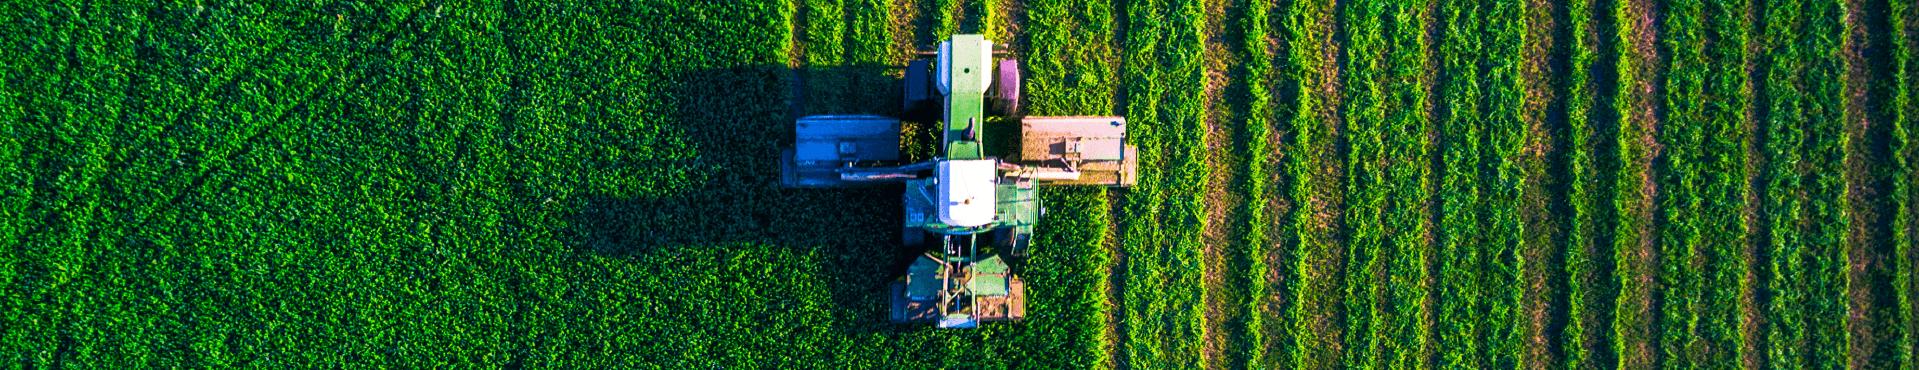 Organic month farming